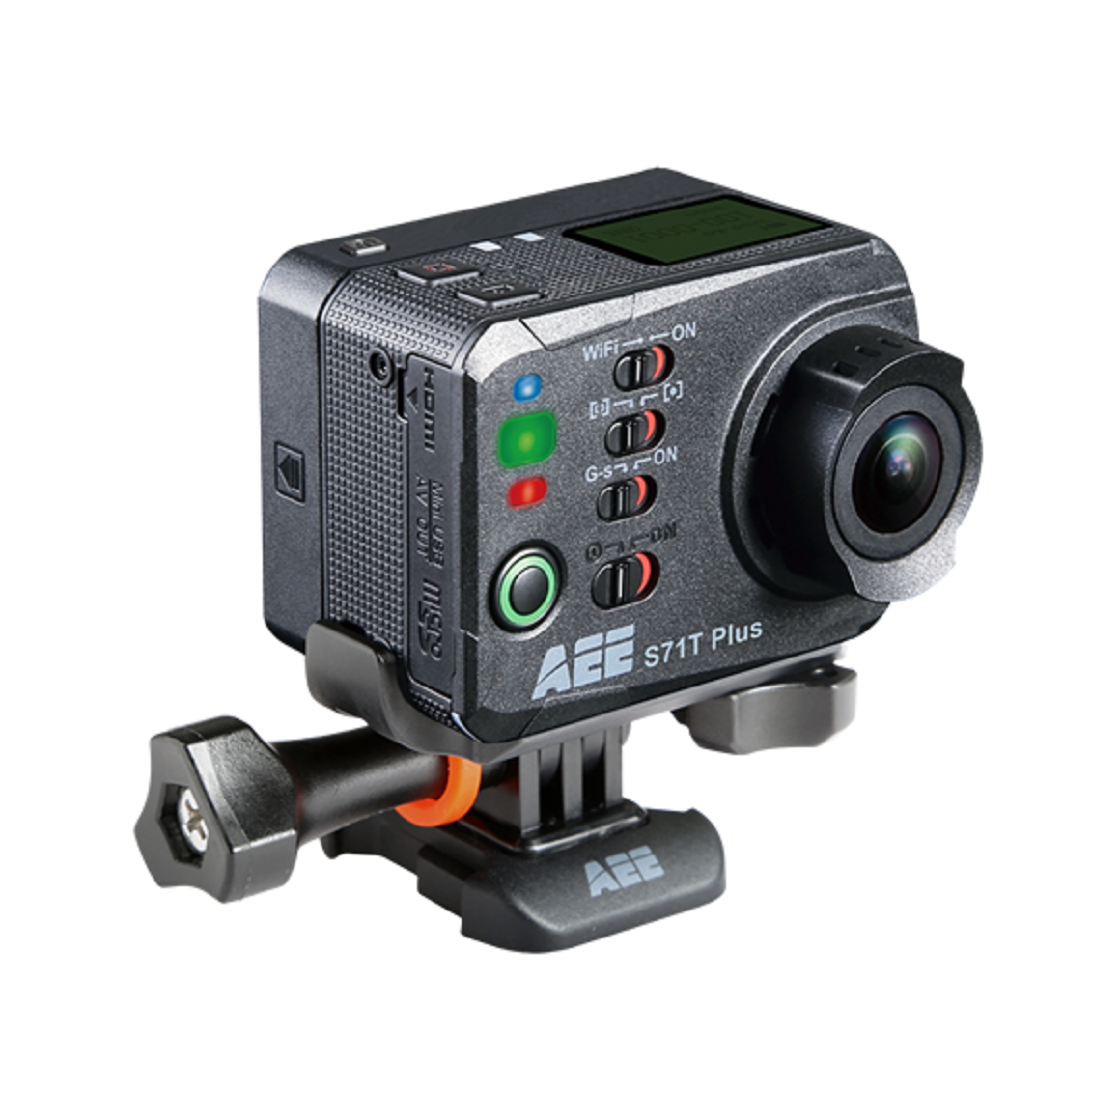 AEE - 4K高清流暢運動攝錄機連IP68防水盒 (型號 : S71T+)